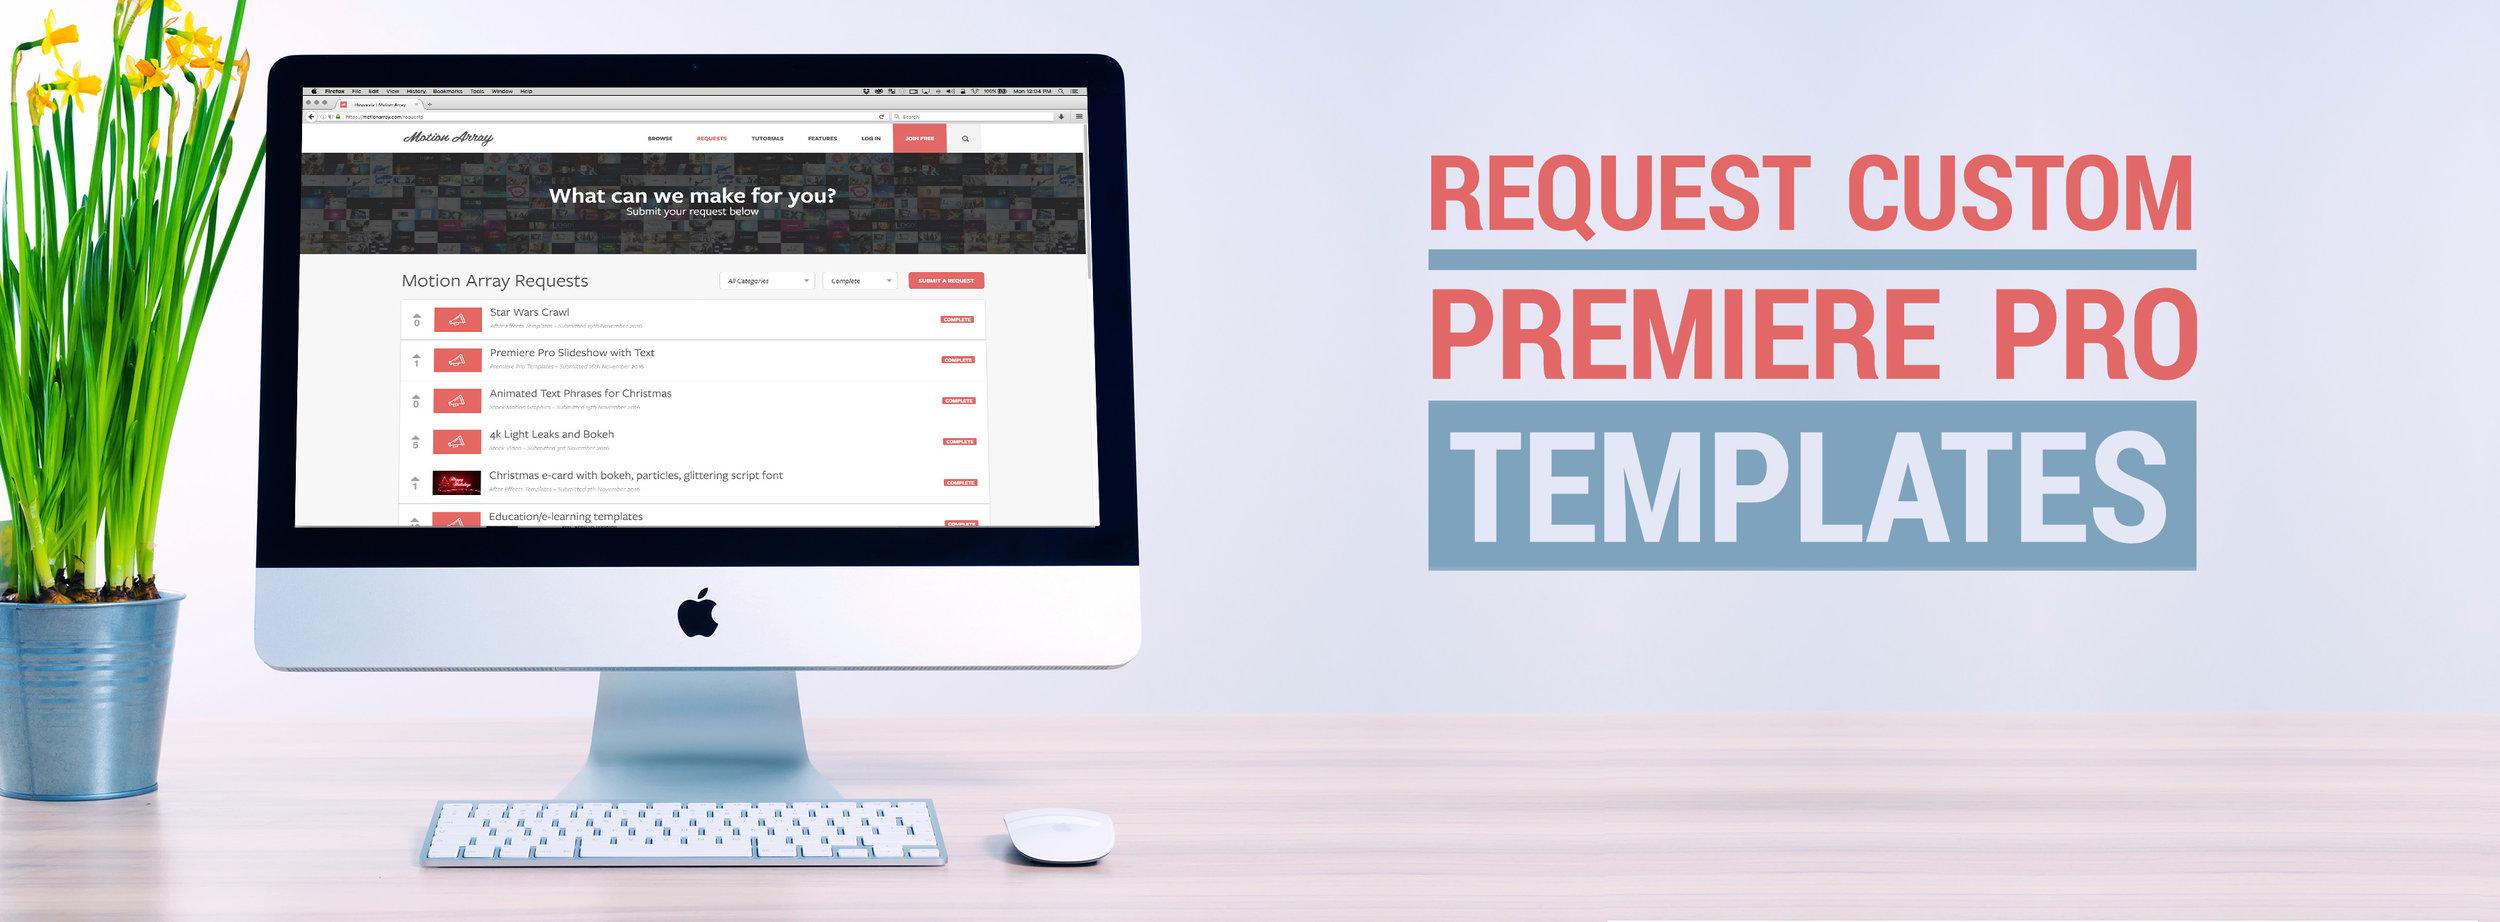 requests premiere pro.jpg